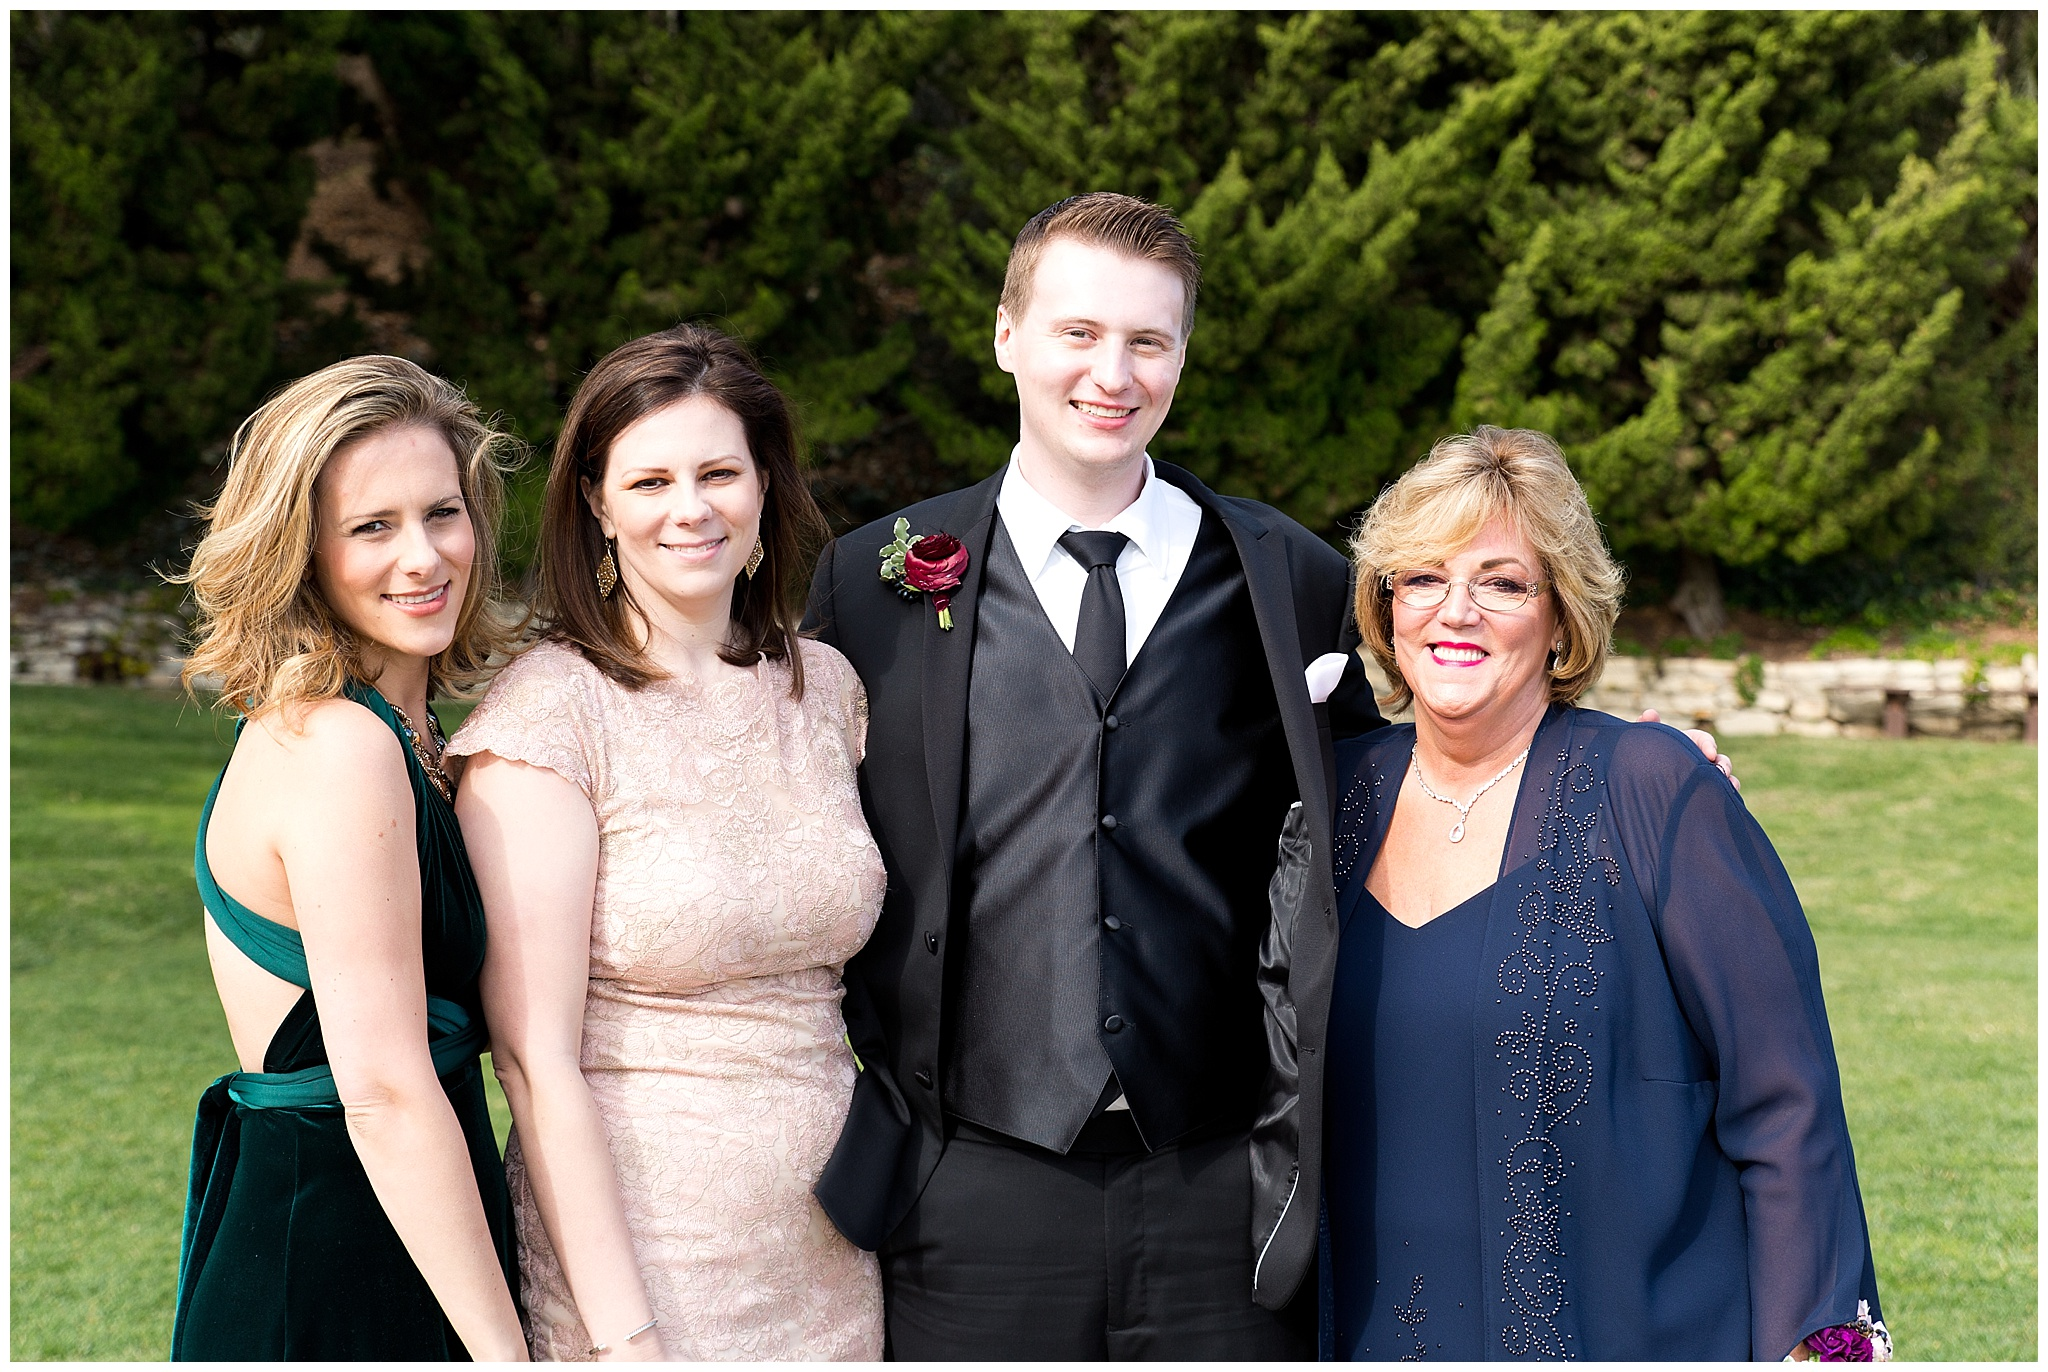 Carol_and_Grant_Wedding_3-3-18-7966.jpg